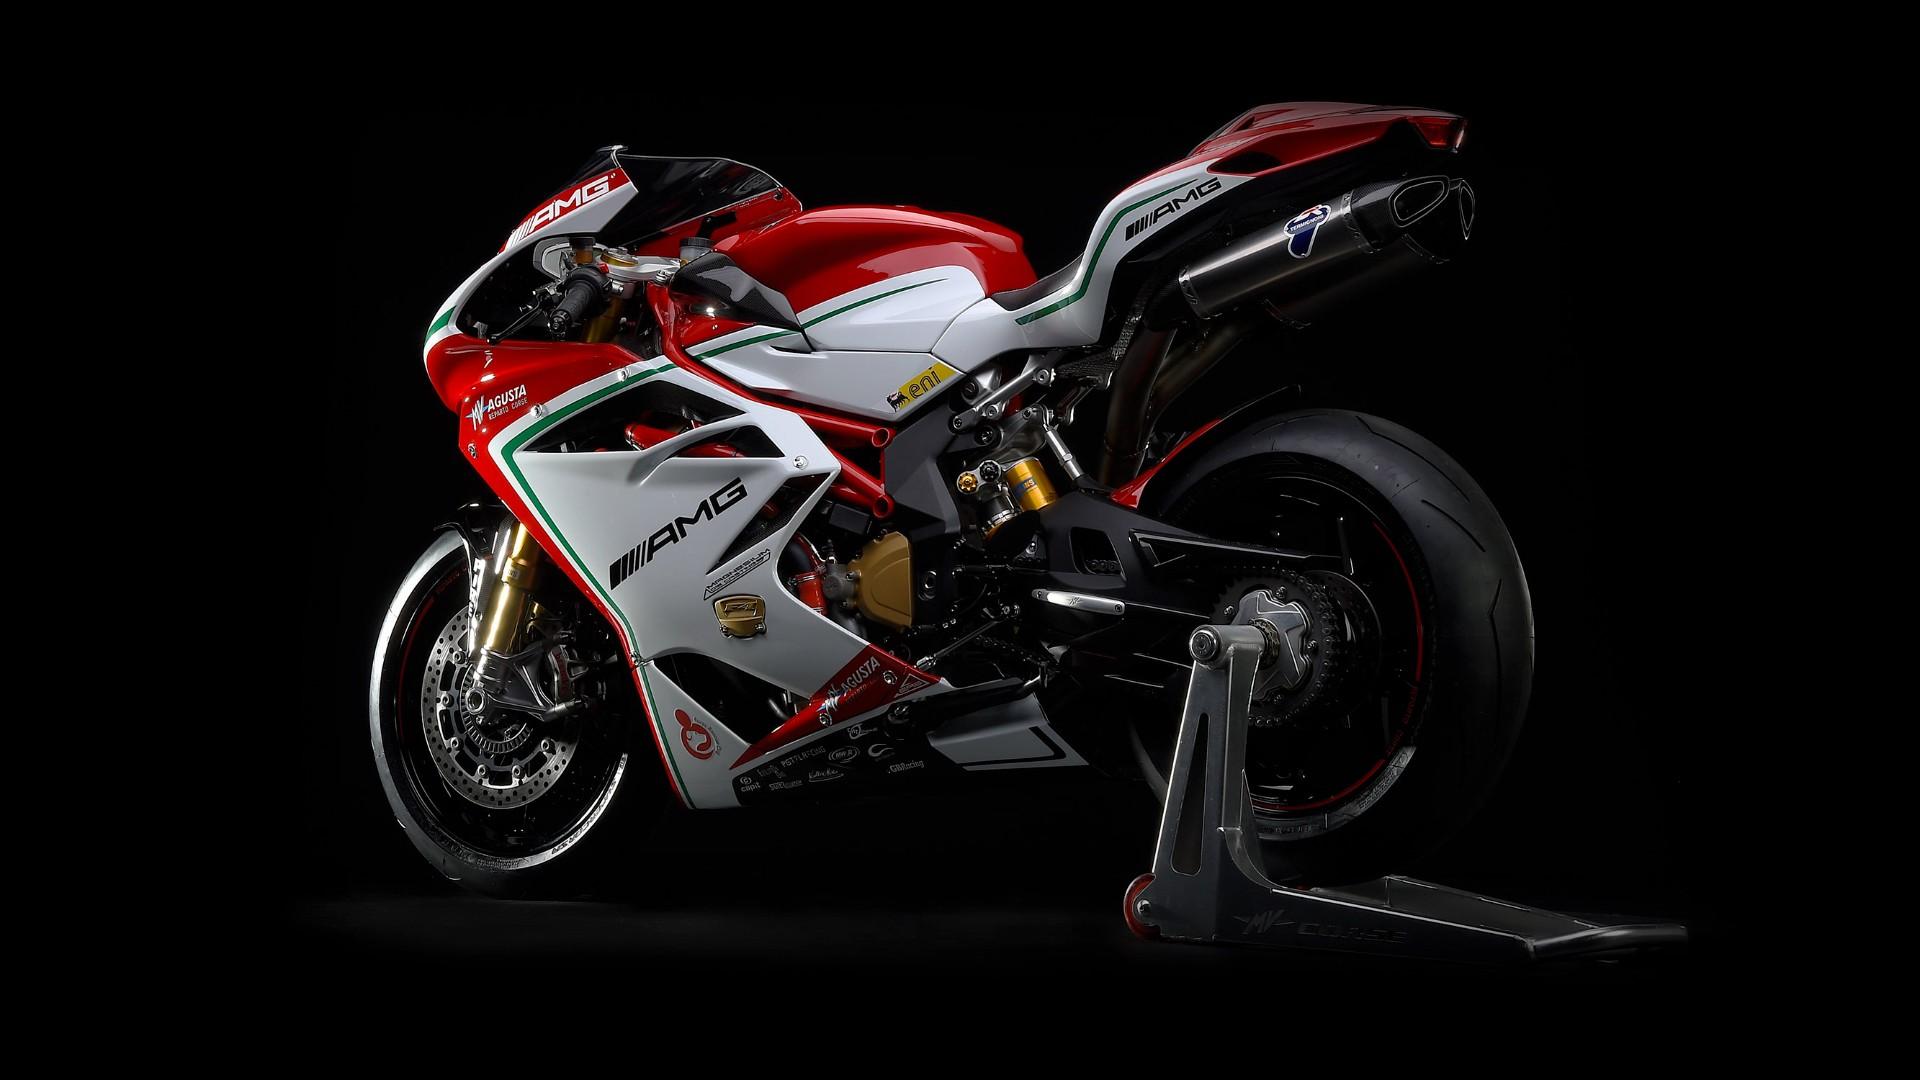 MV AGUSTA BRUTALE 1000 RS CONFIRMED Australian Motorcycle News